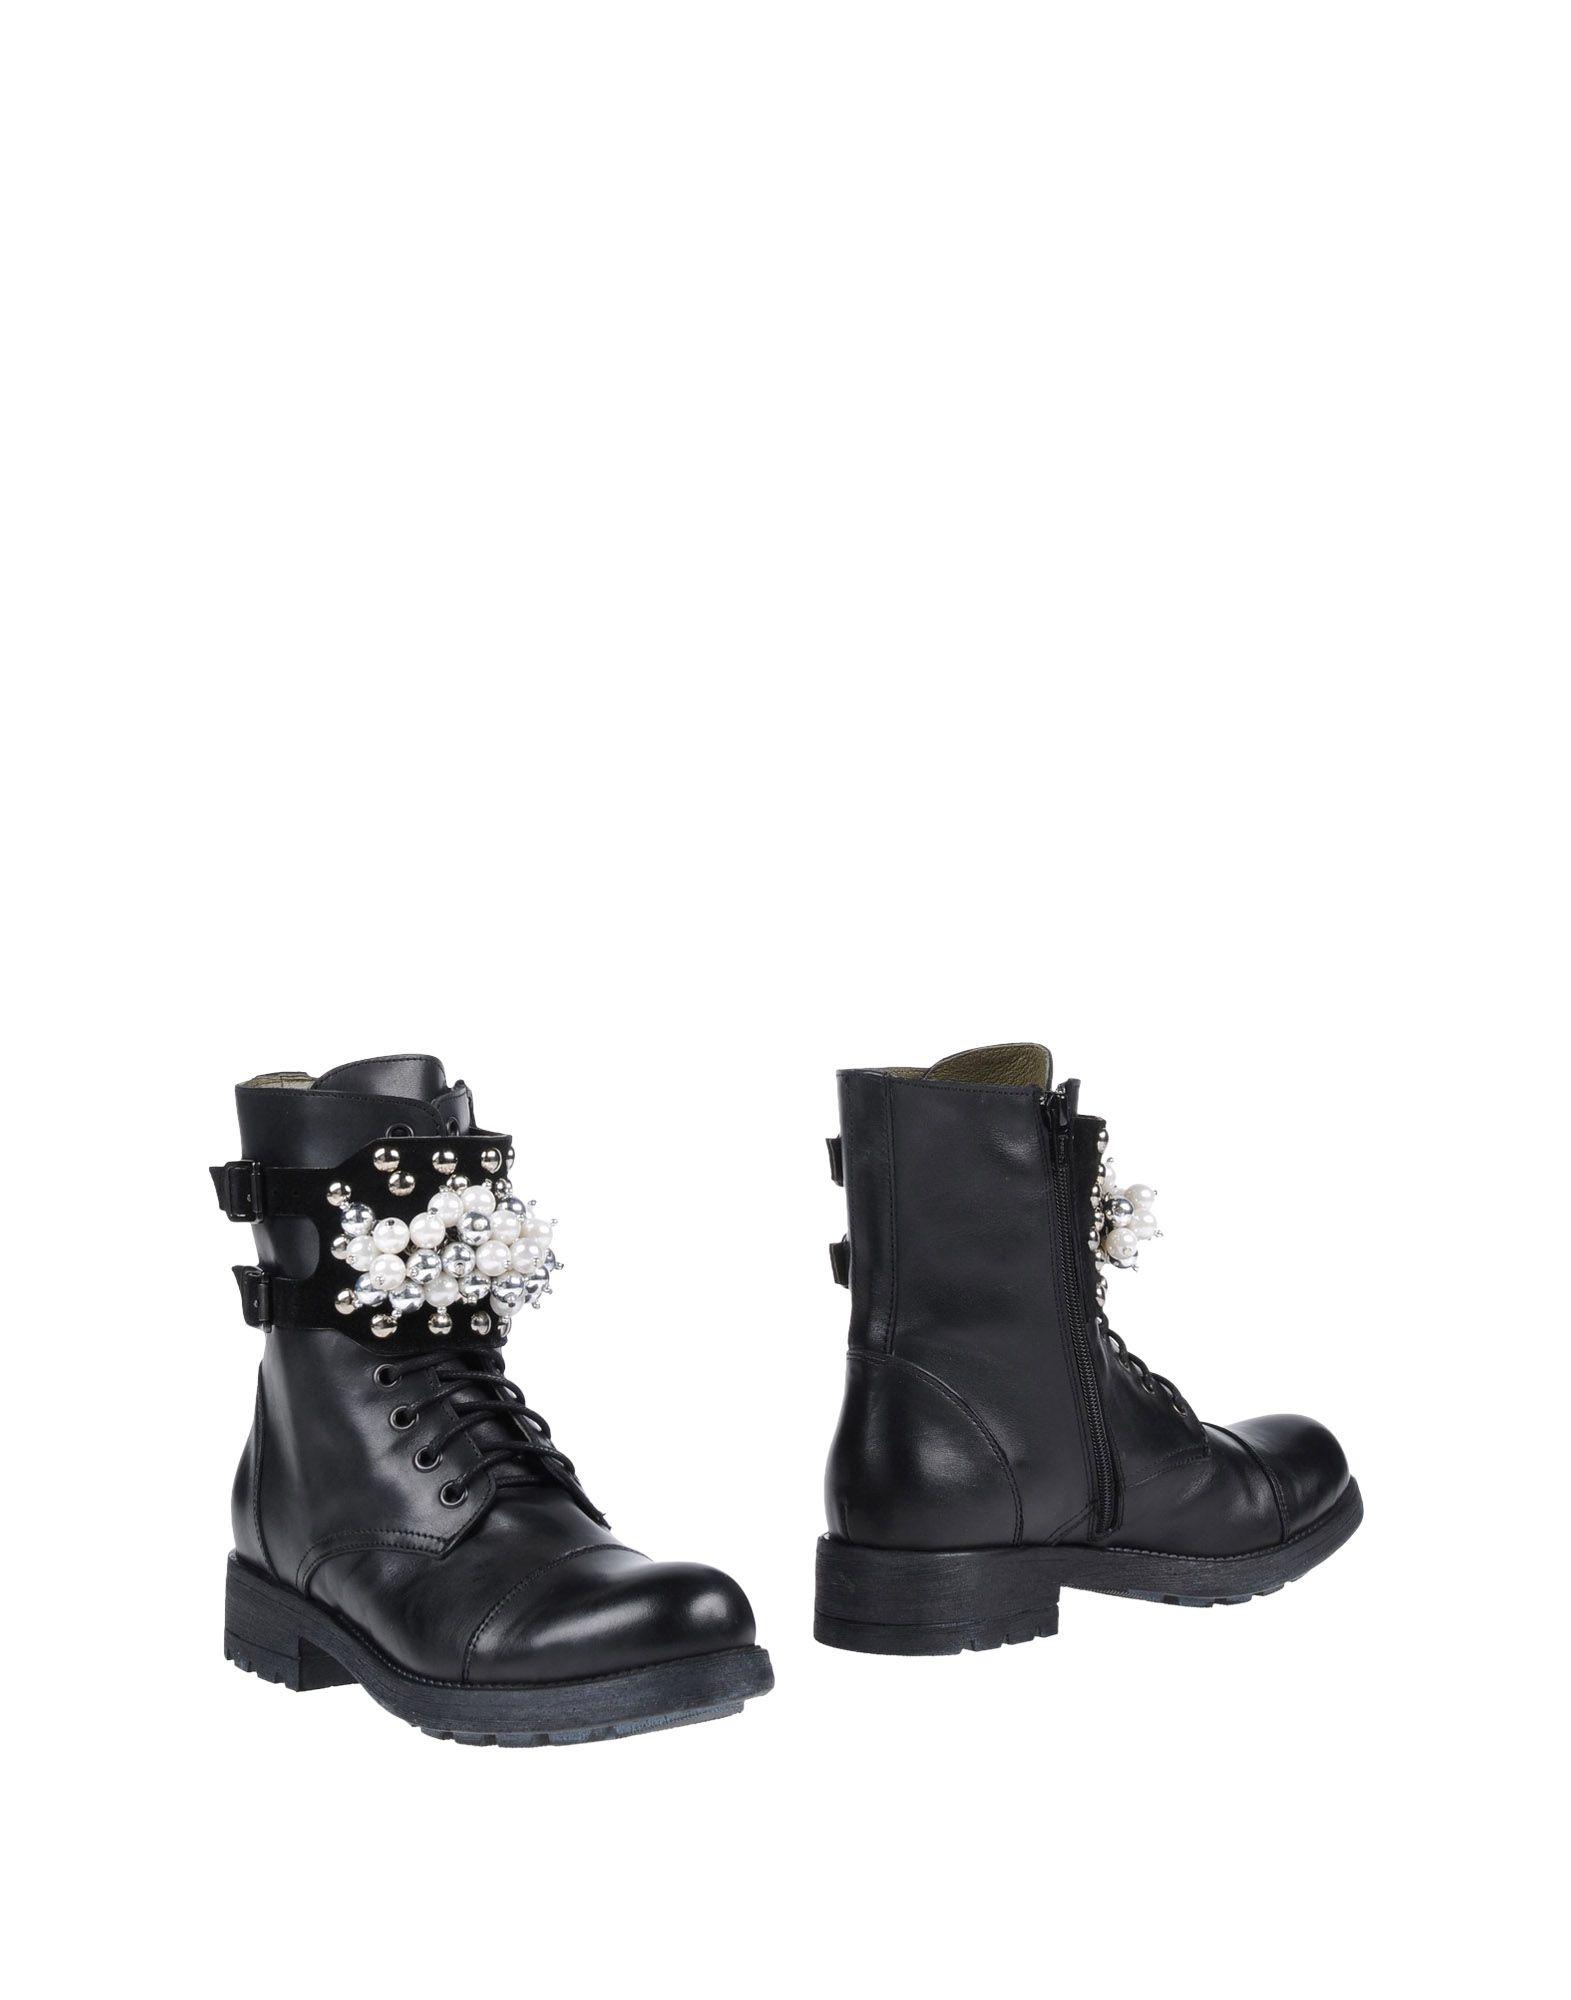 Charme Stiefelette Damen  11454891HS Gute Schuhe Qualität beliebte Schuhe Gute 2ca02d